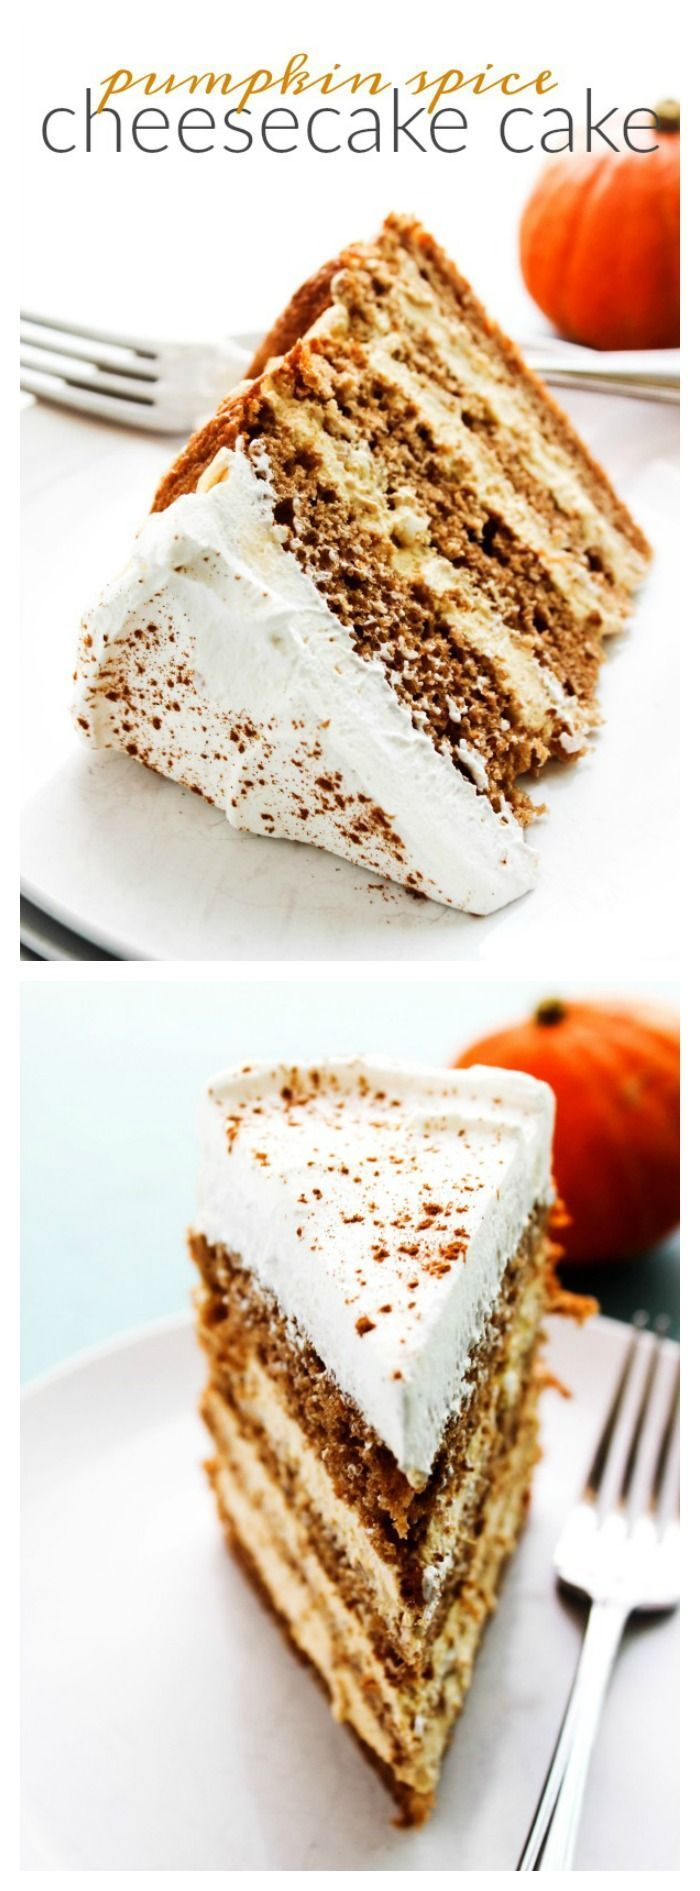 Best 25+ Pumpkin spice cake ideas on Pinterest | Pumpkin cake ...